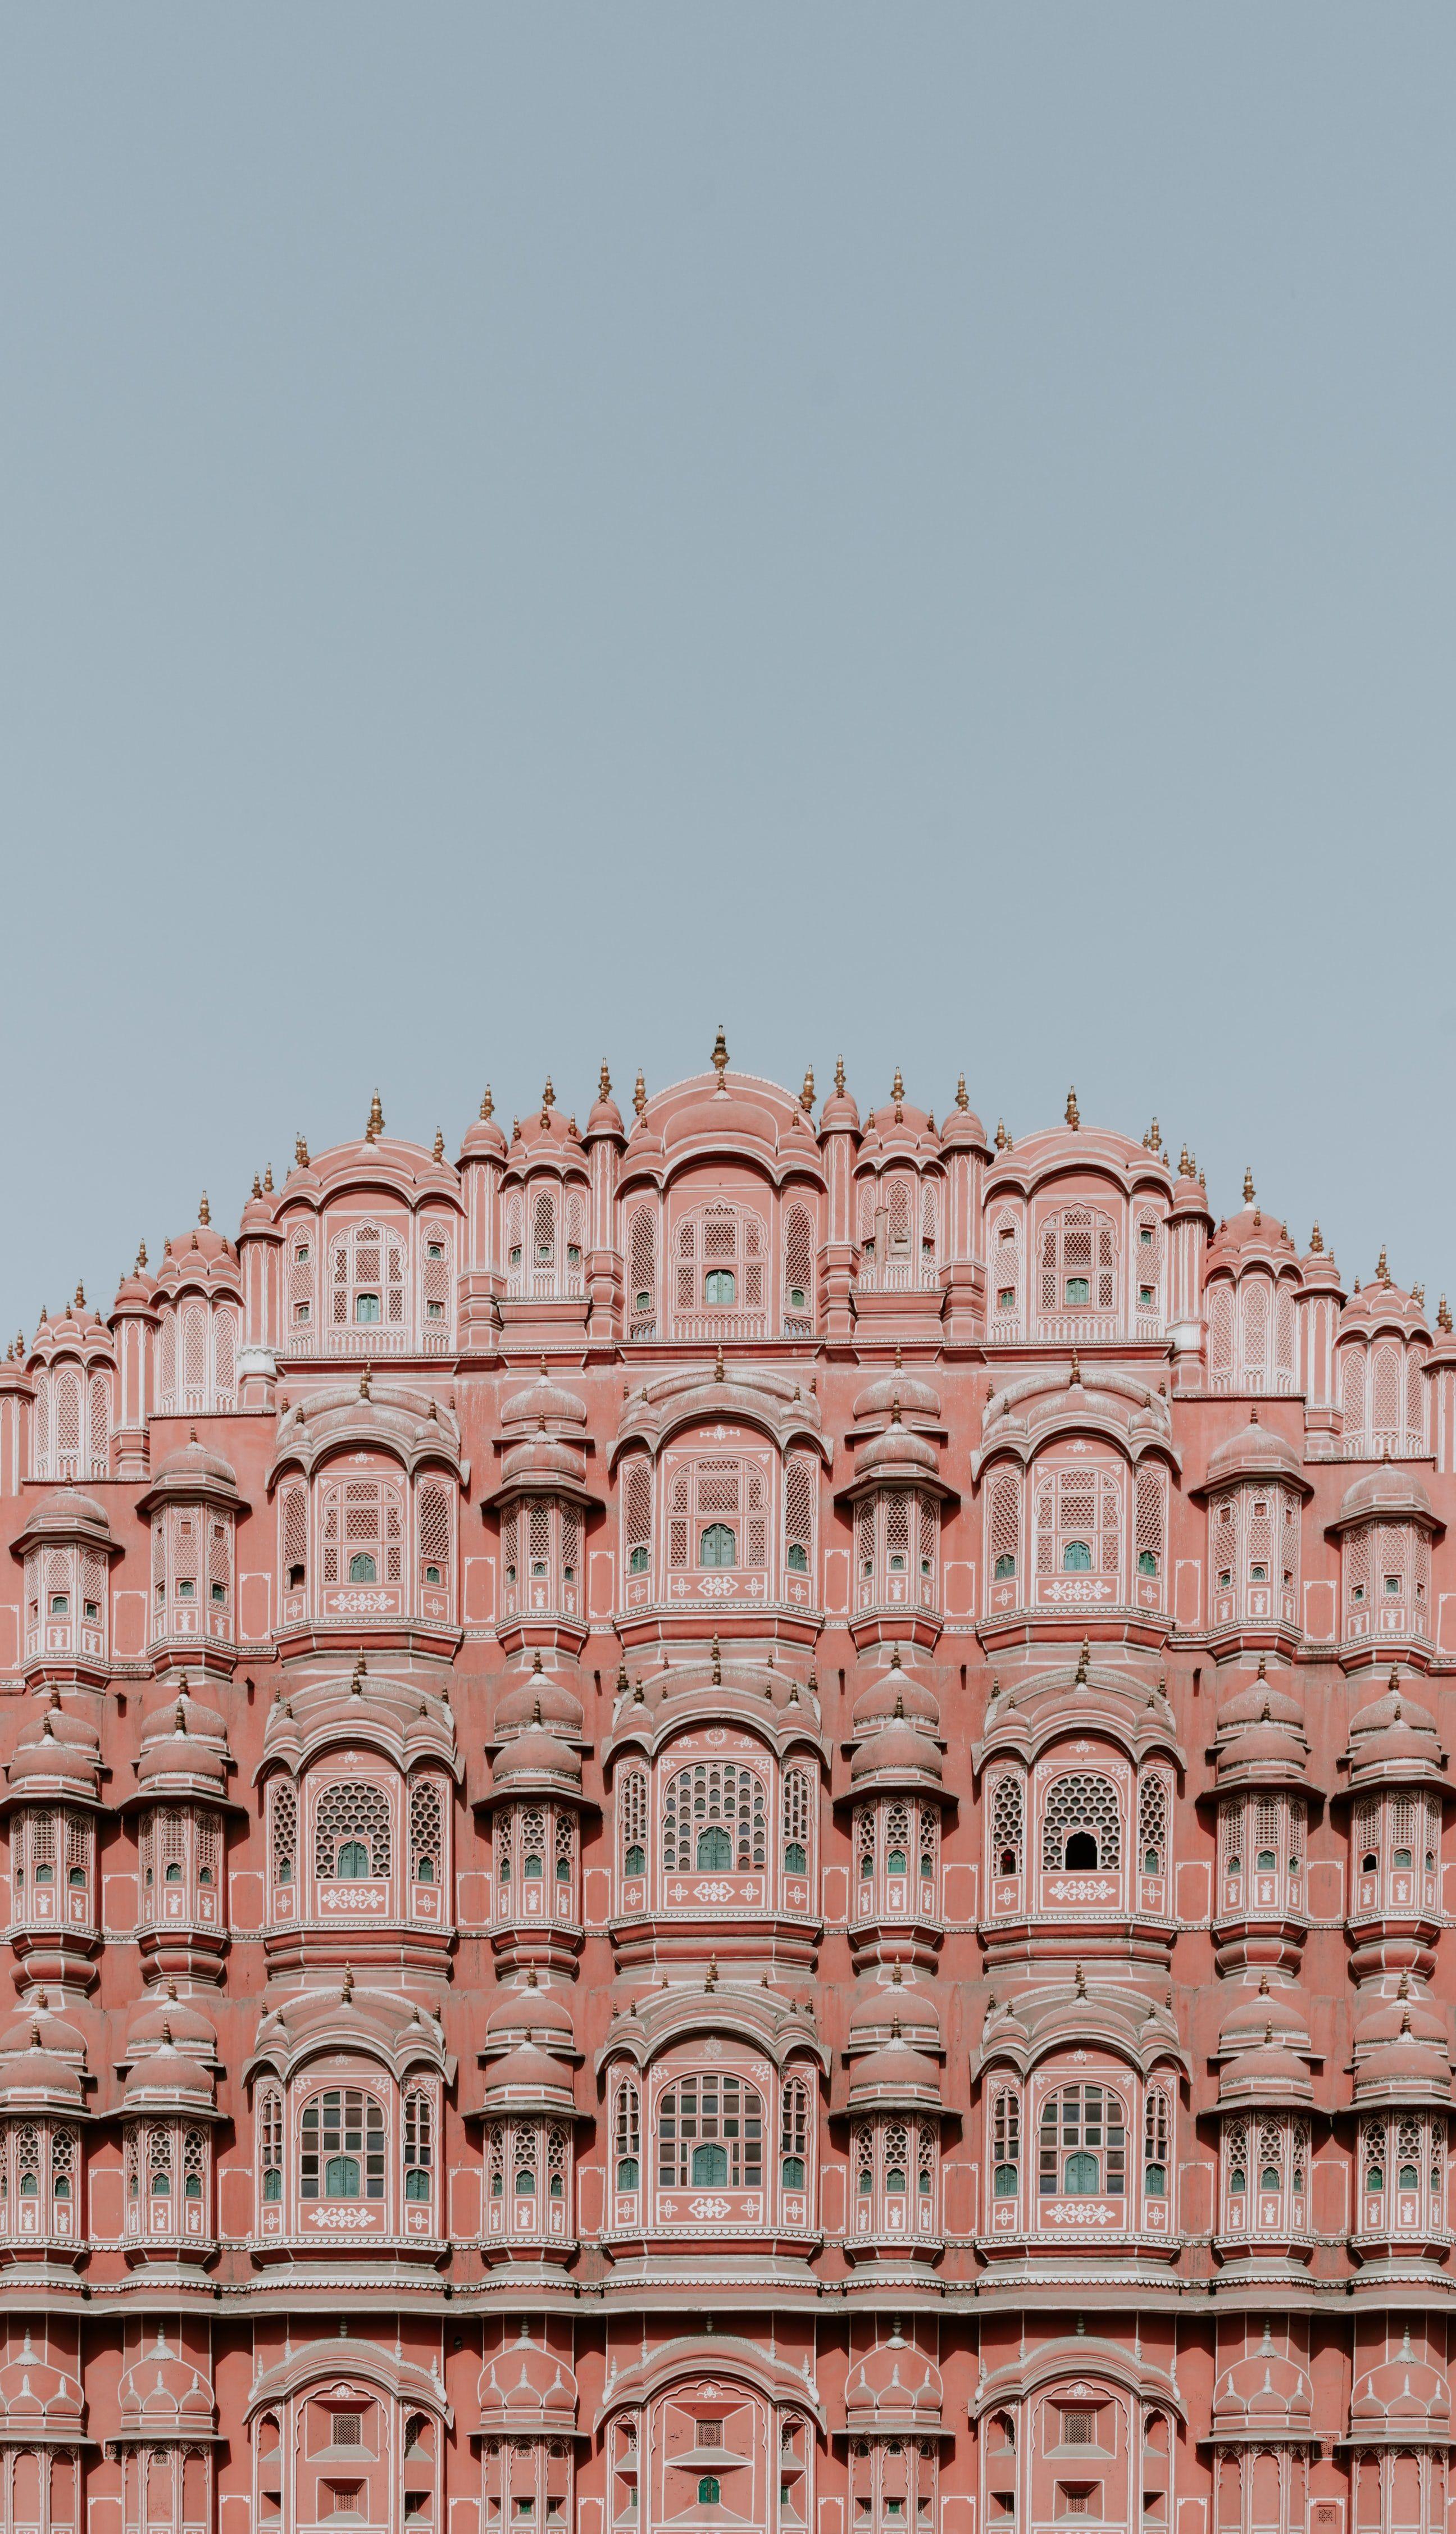 Hawa Mahal Road Jaipur India Architecture Photography Travel Aesthetic Photo